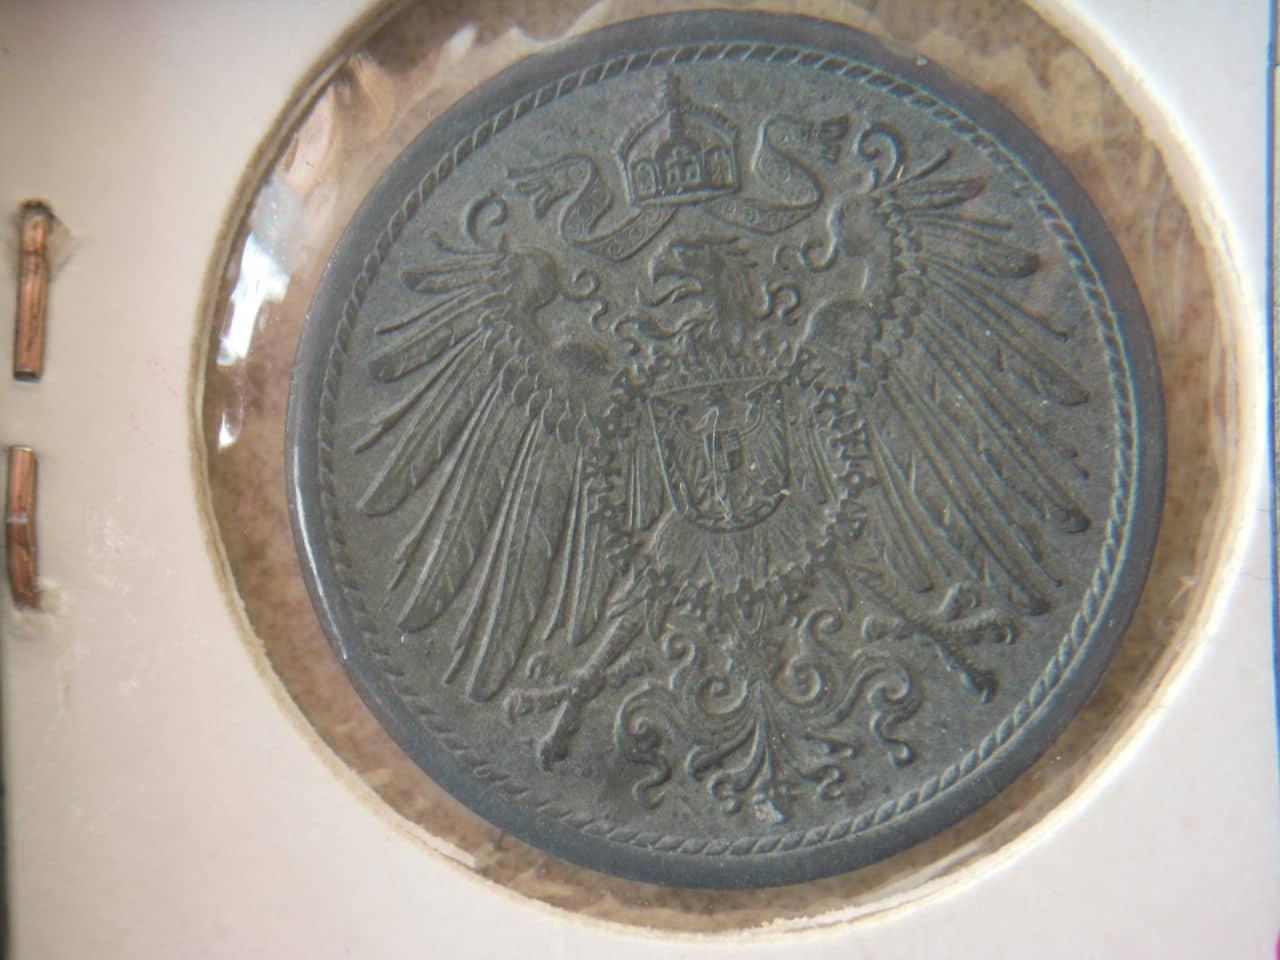 10 Pfennig 1921 Alemania Ceca? DSCN0890